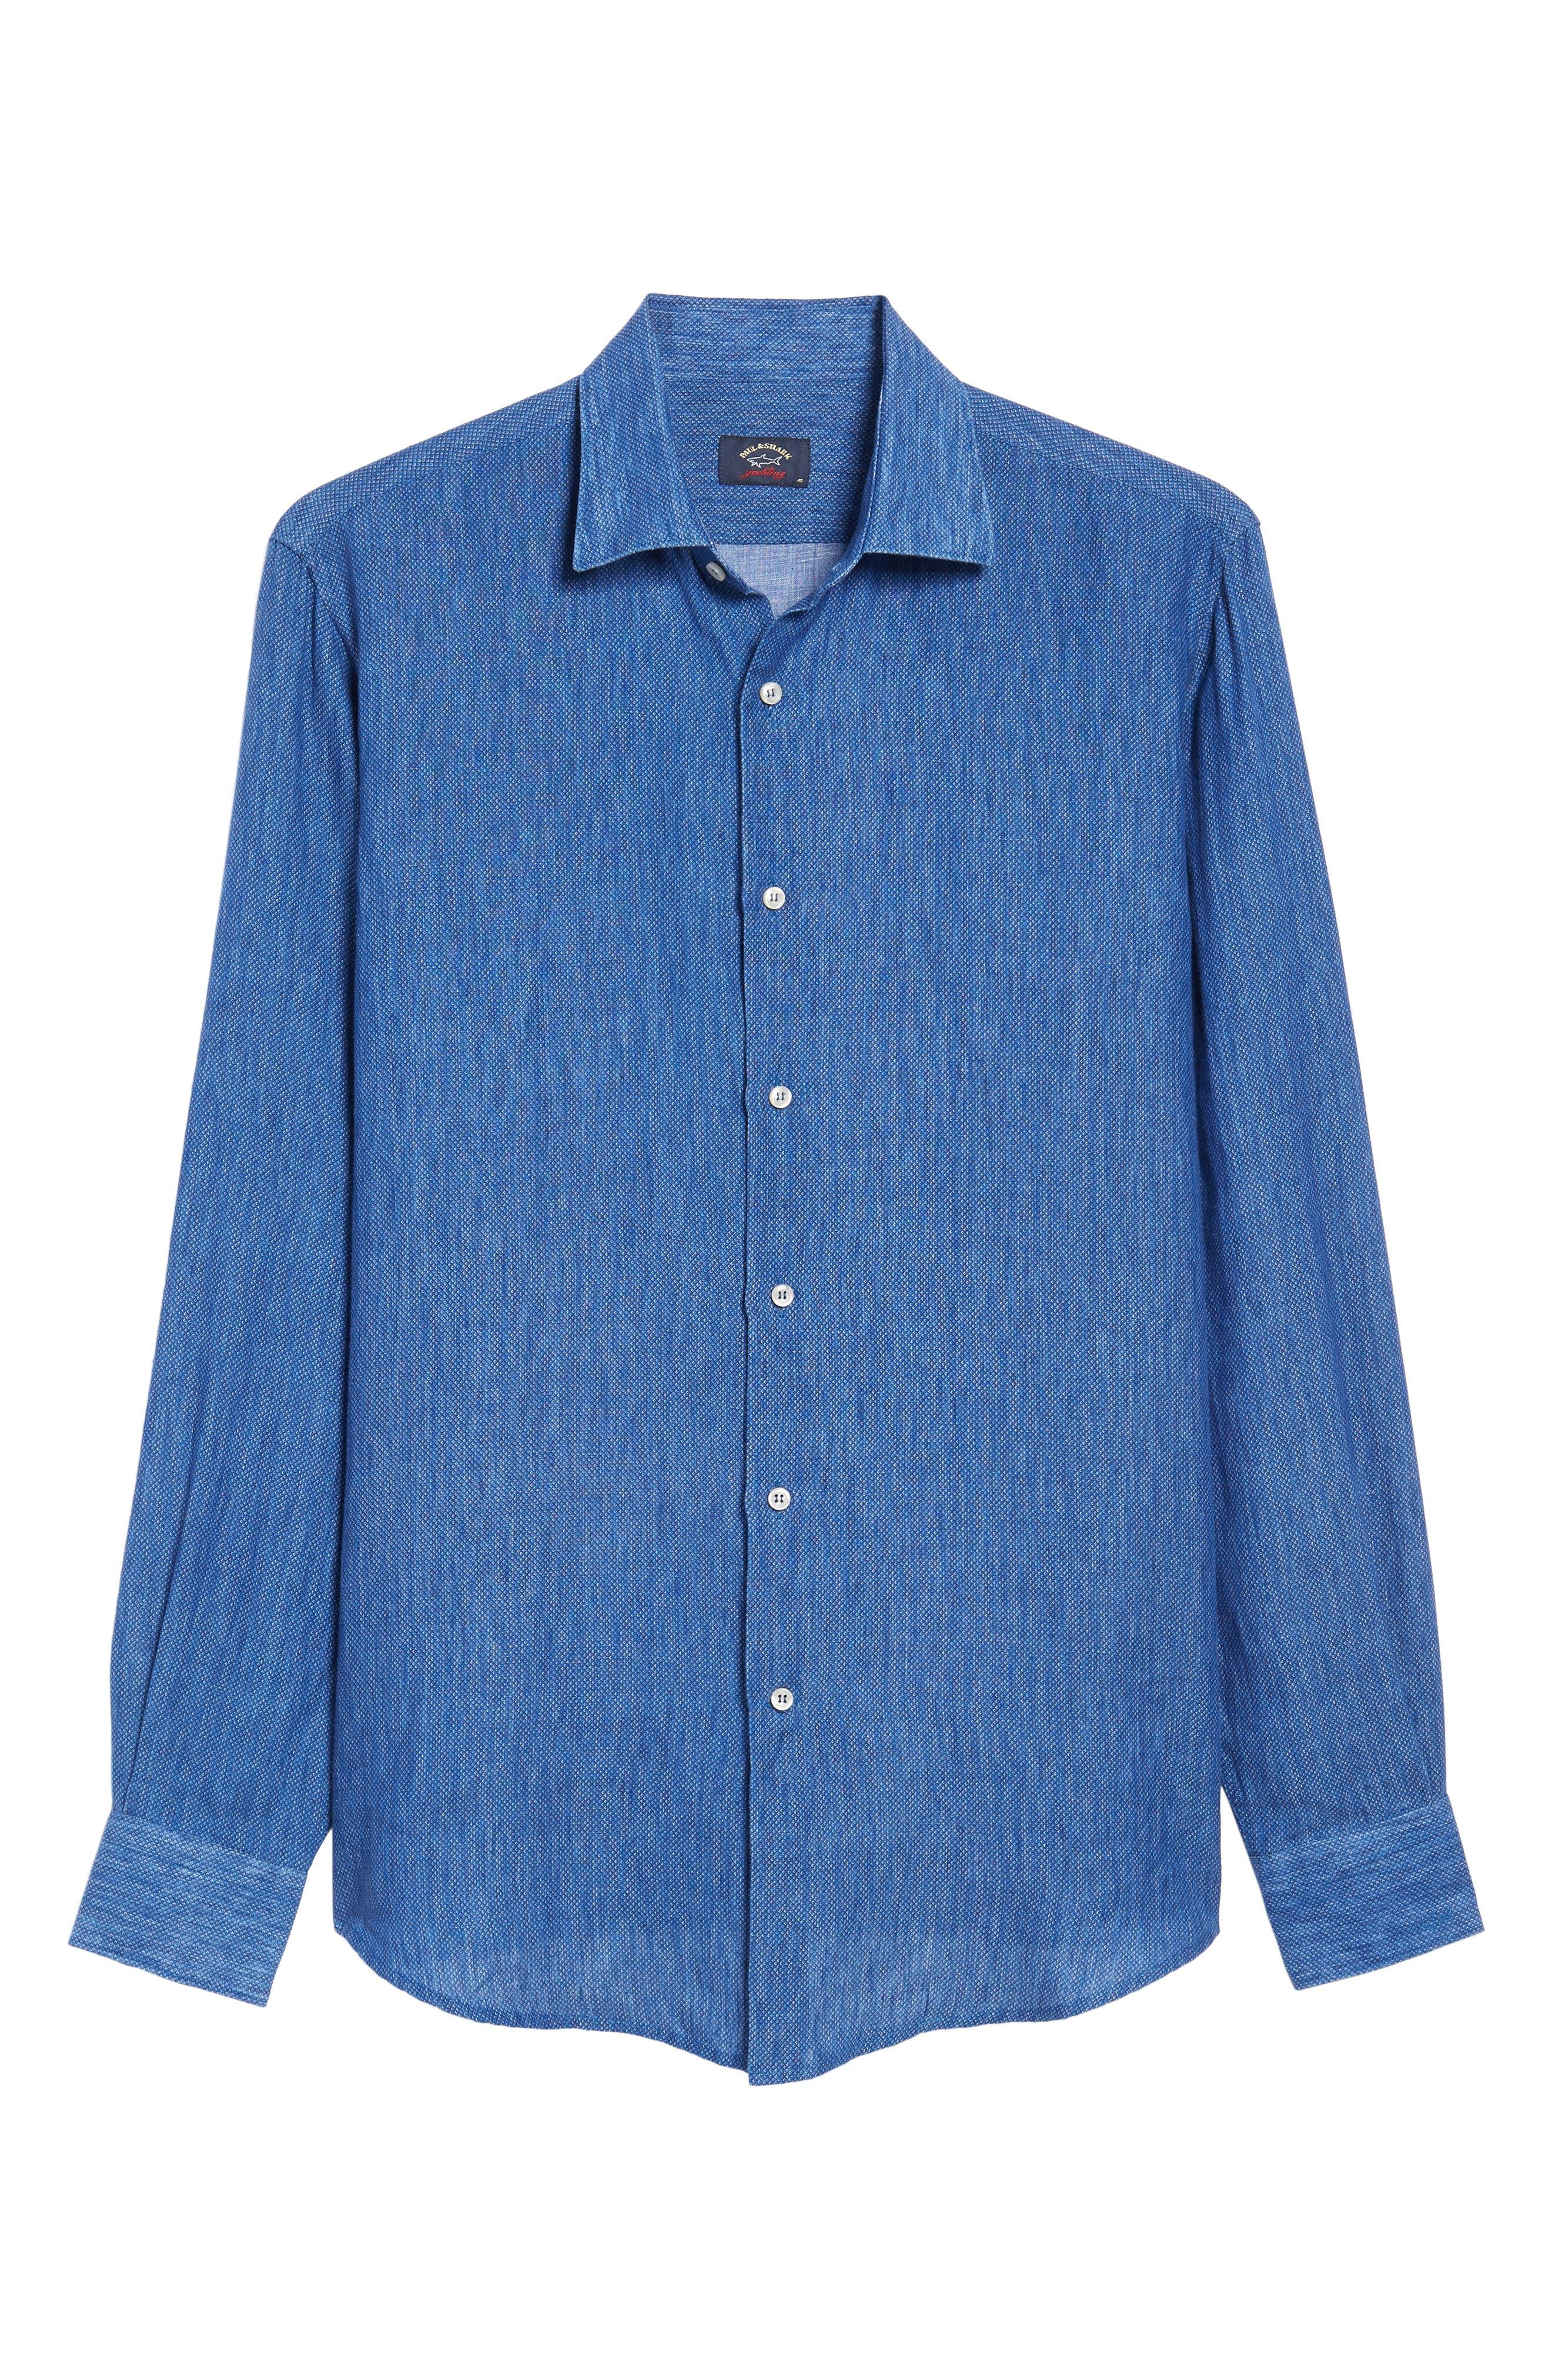 Paul&Shark Regular Fit Piqué Sport Shirt,                             Alternate thumbnail 6, color,                             Blue